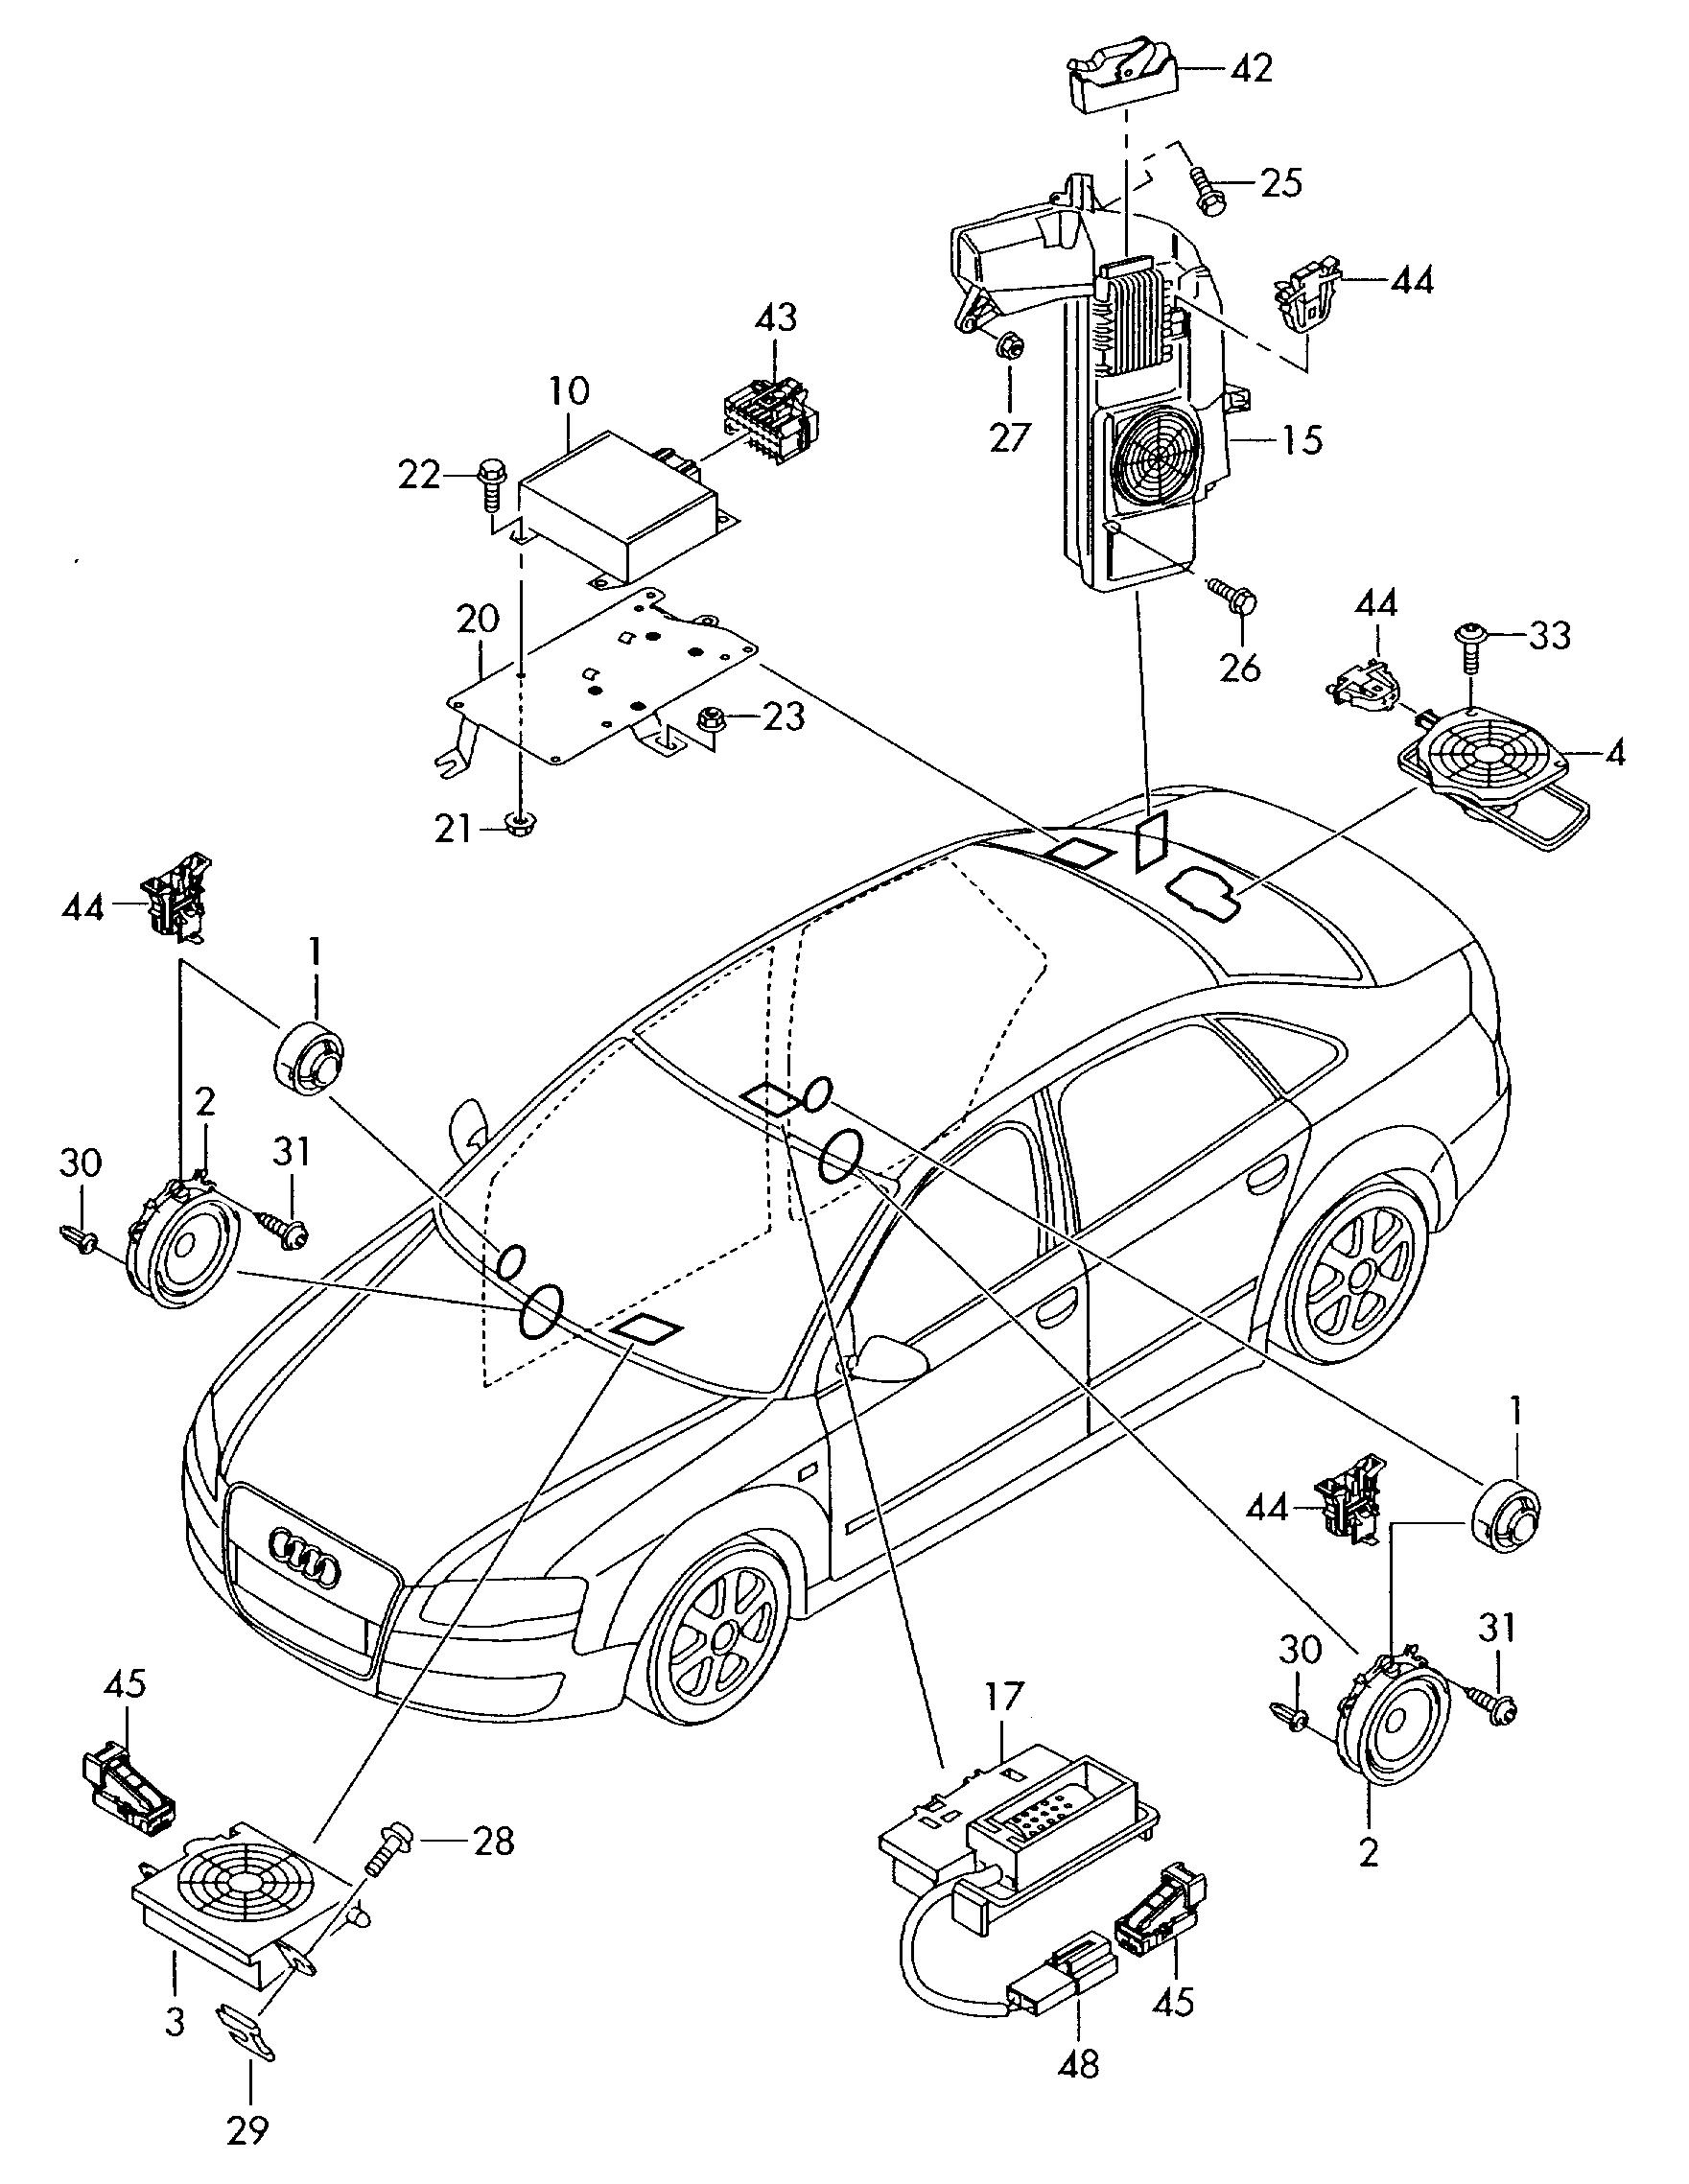 2006 audi a4 parts diagram etka  audi  auto parts catalog